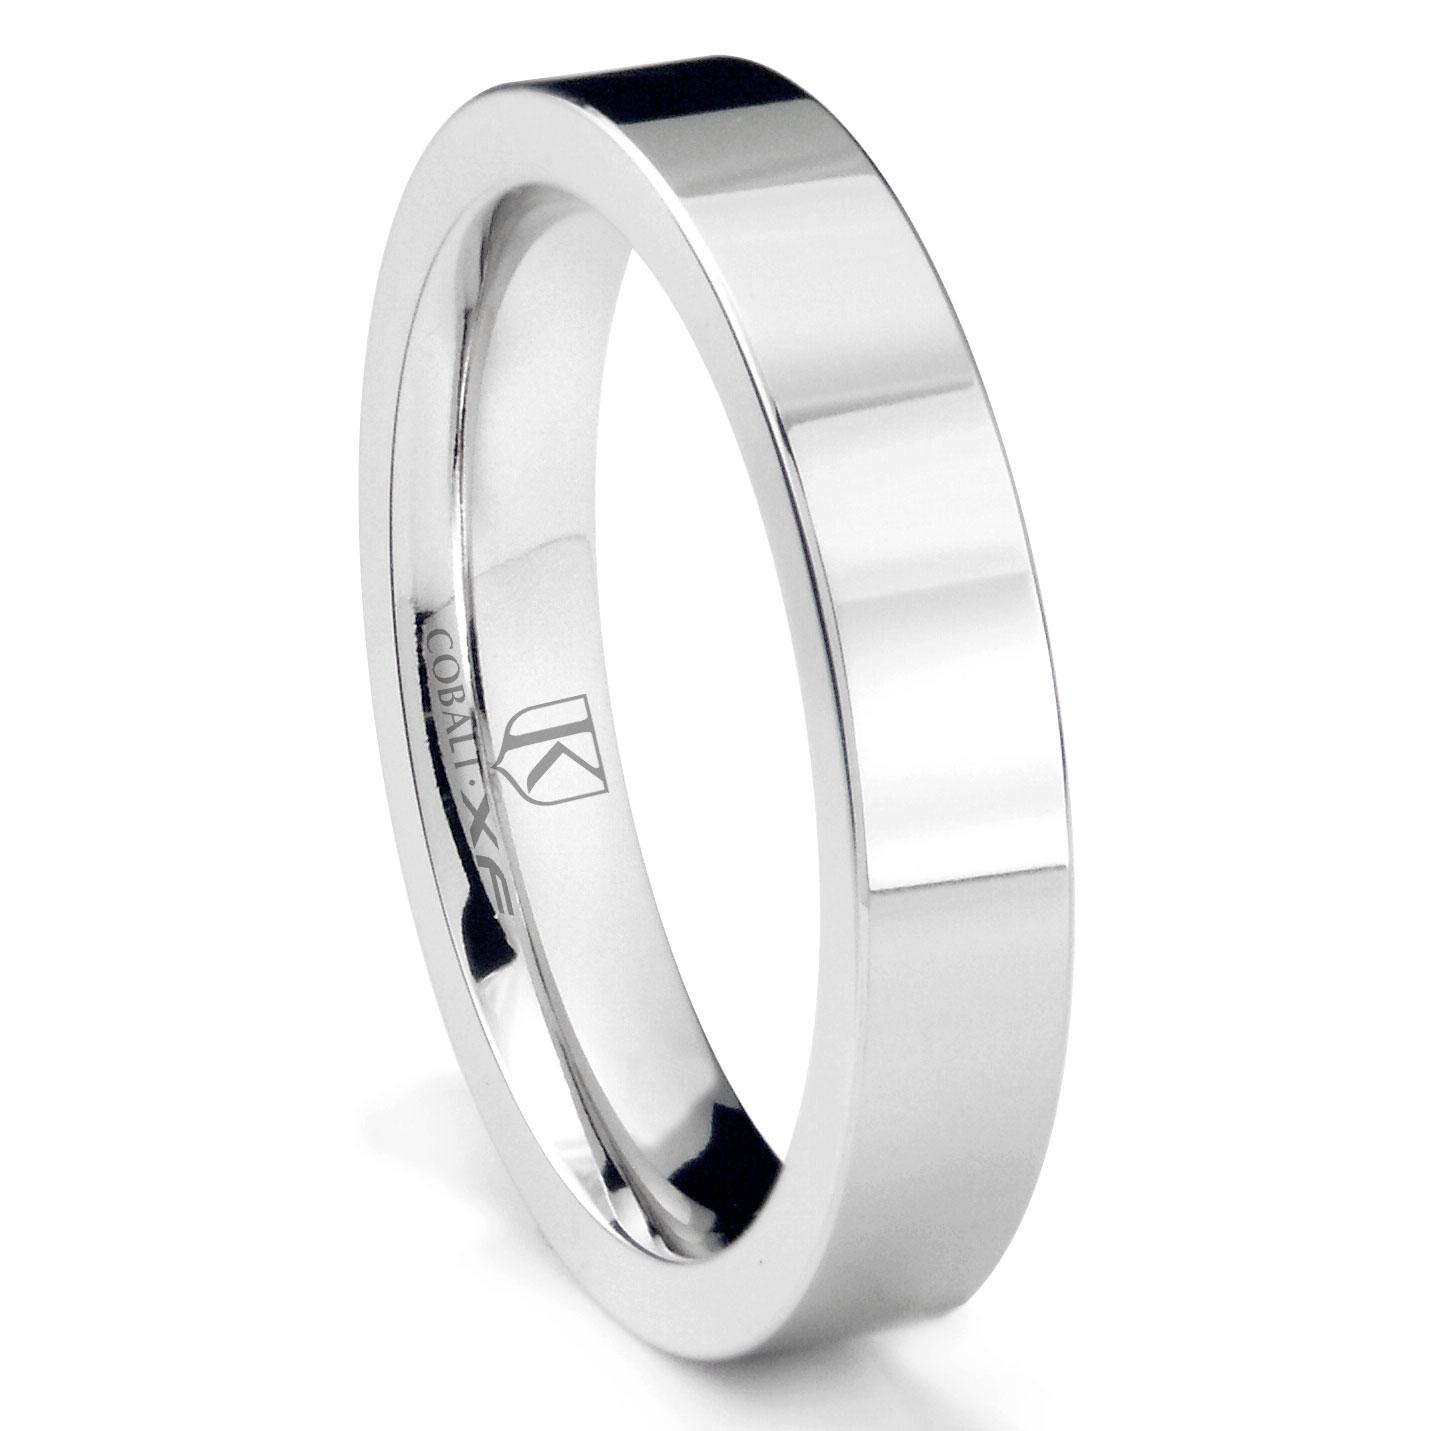 Cobalt XF Chrome 4MM Flat Wedding Band Ring